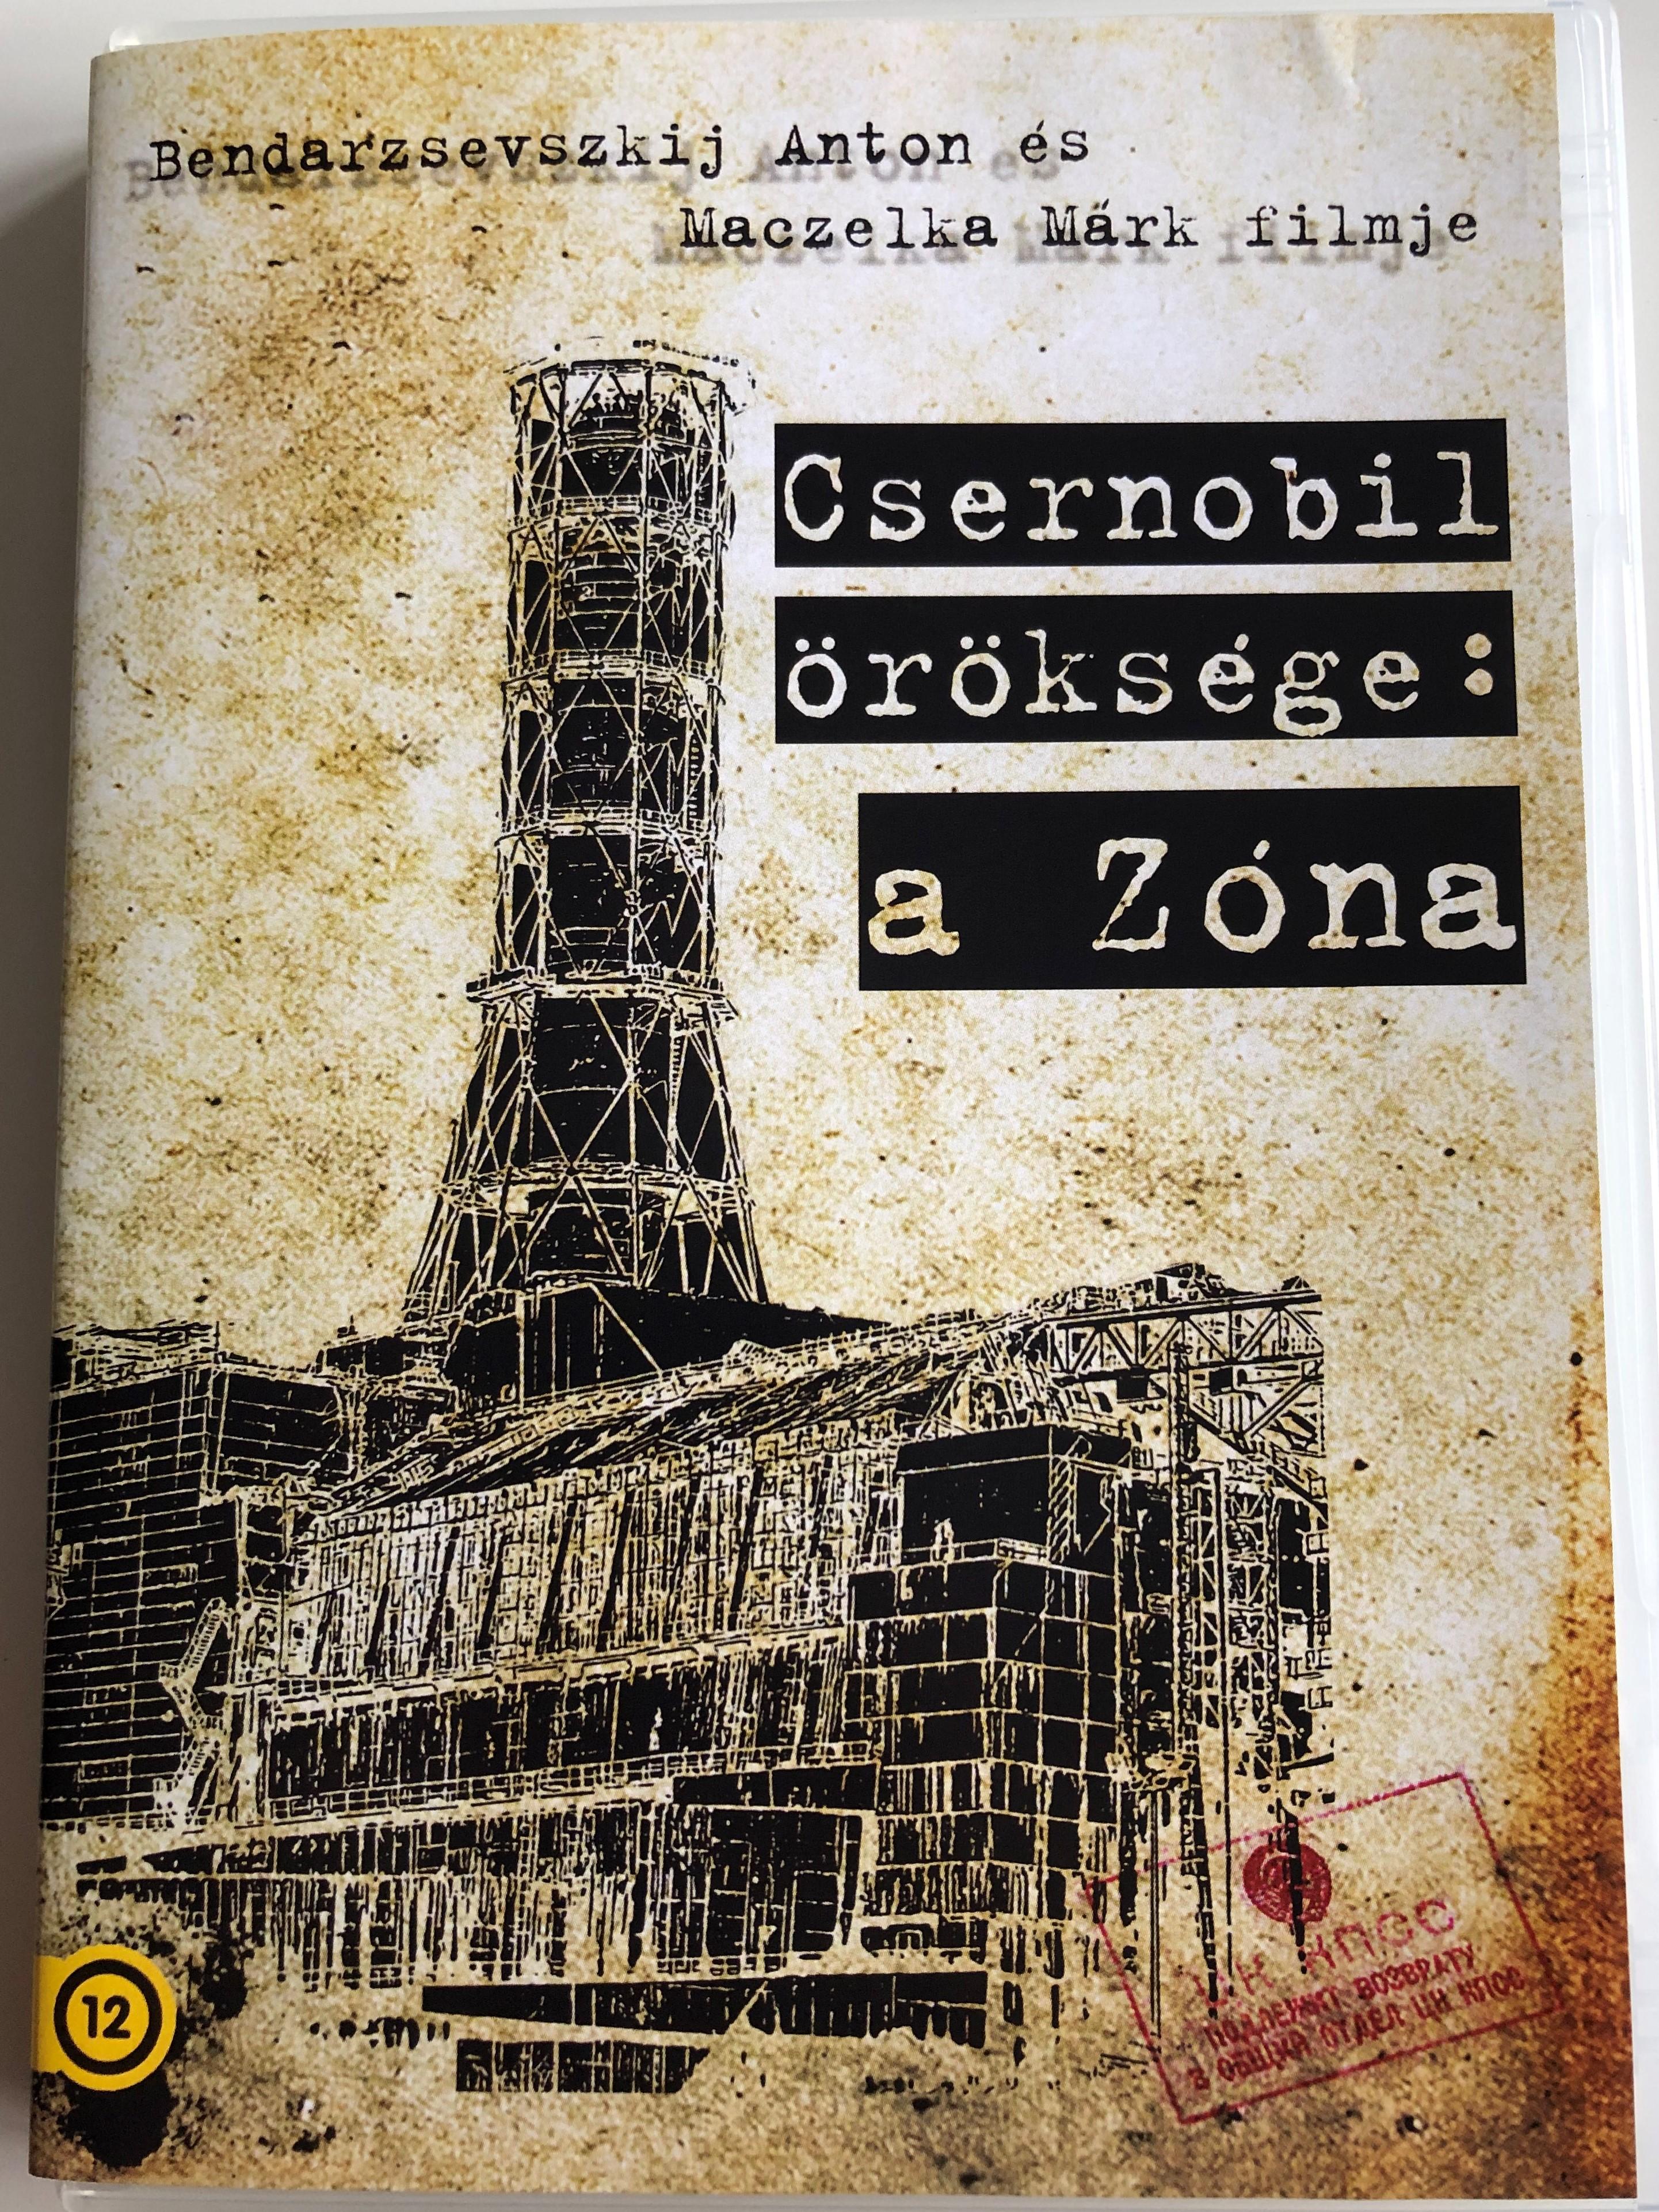 csernobil-r-ks-ge-a-z-na-dvd-2011-chernobyl-legacy-the-zone-1.jpg